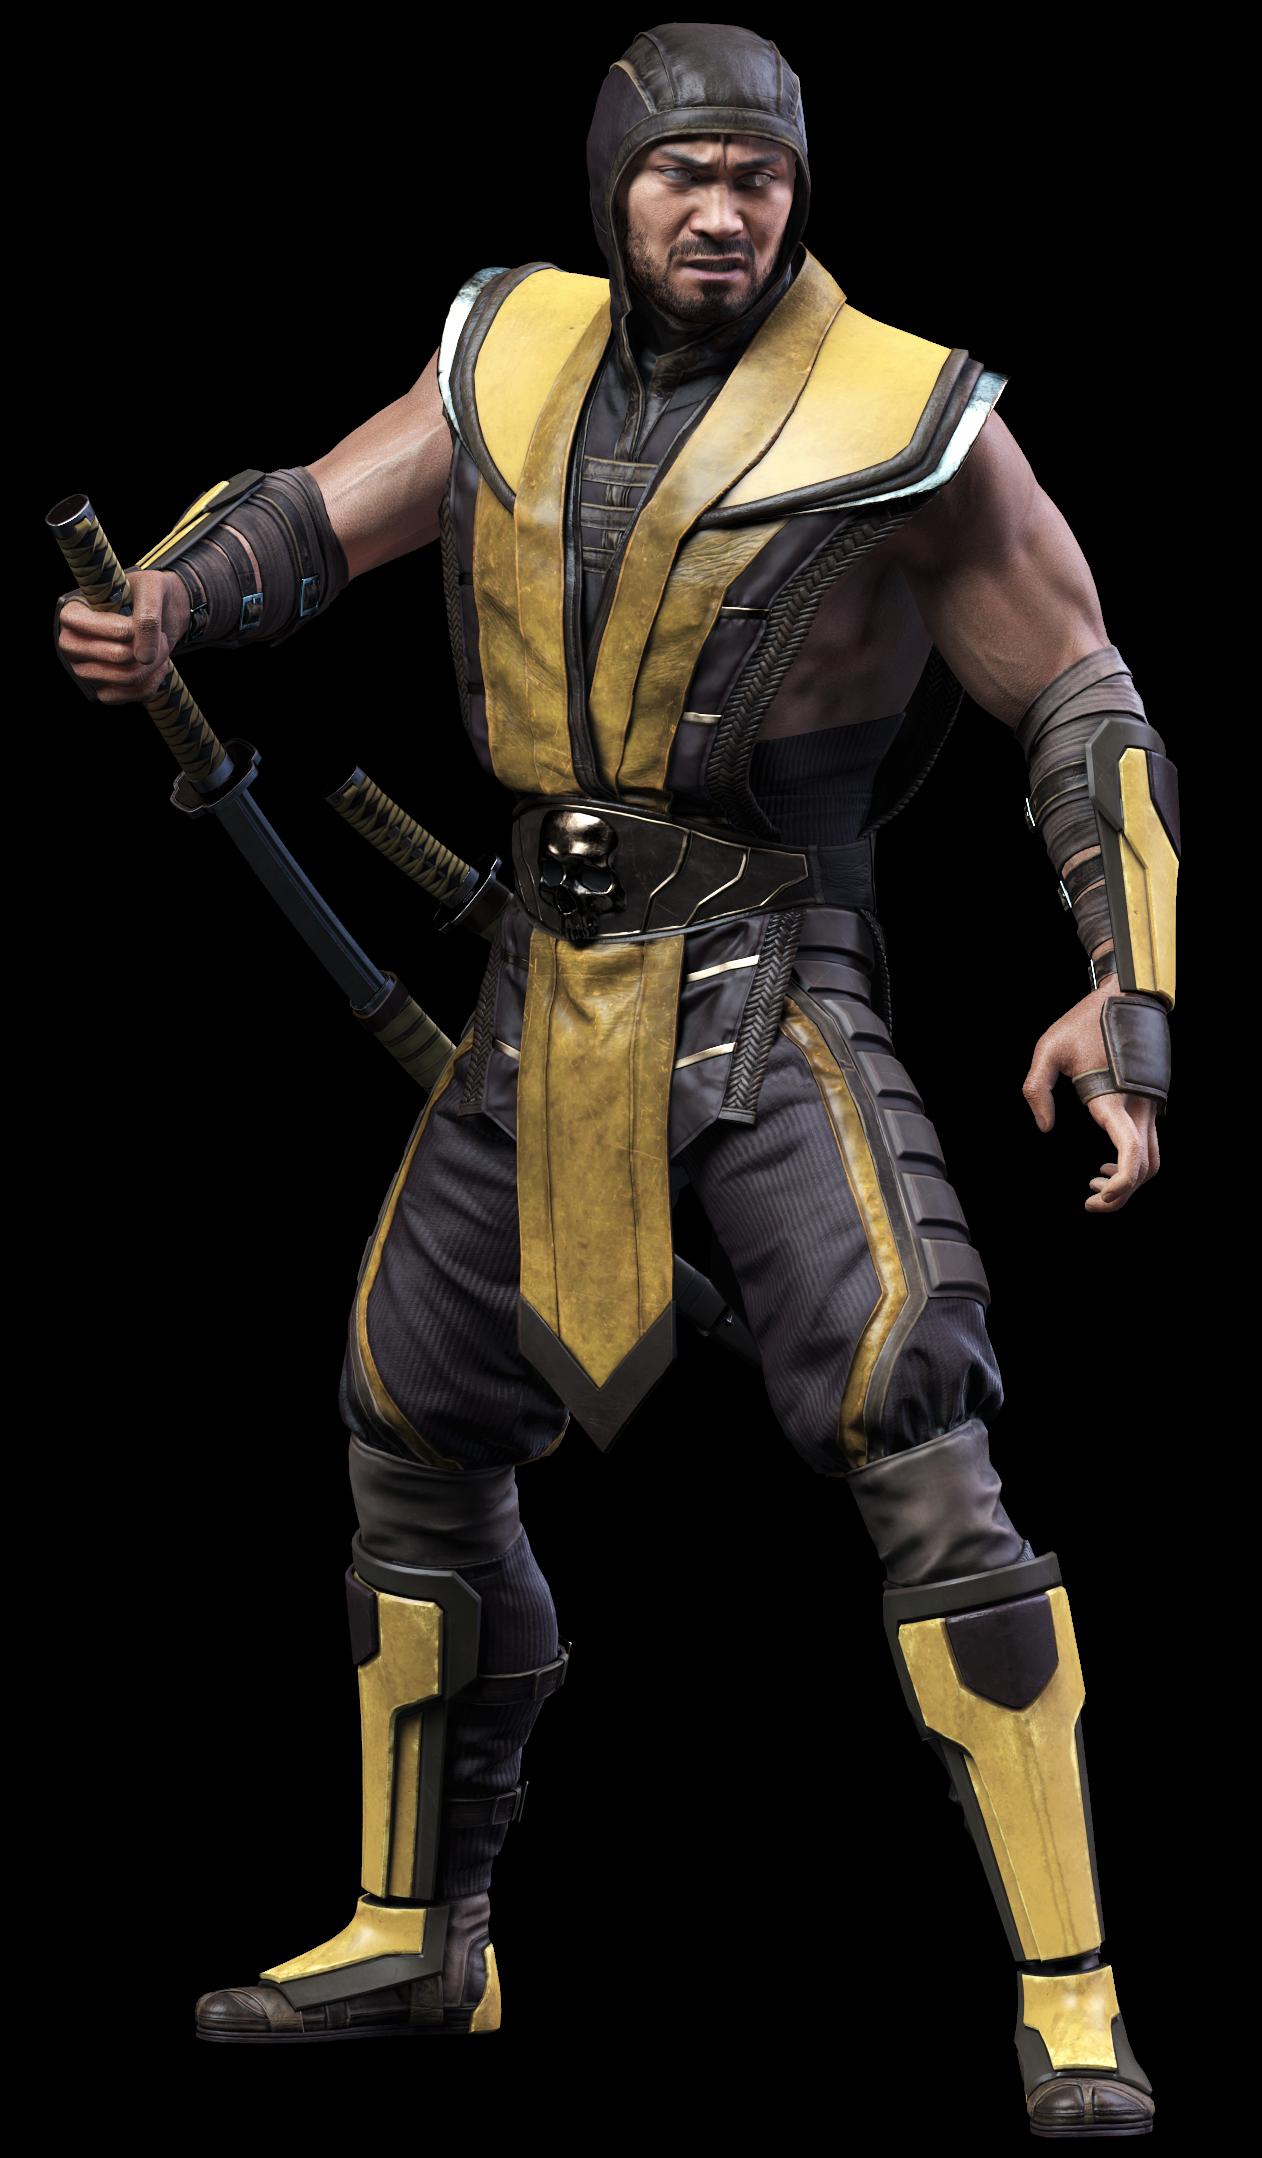 Scorpion By Vindicutie On Deviantart Mortal Kombat Characters Scorpion Mortal Kombat Mortal Kombat Art